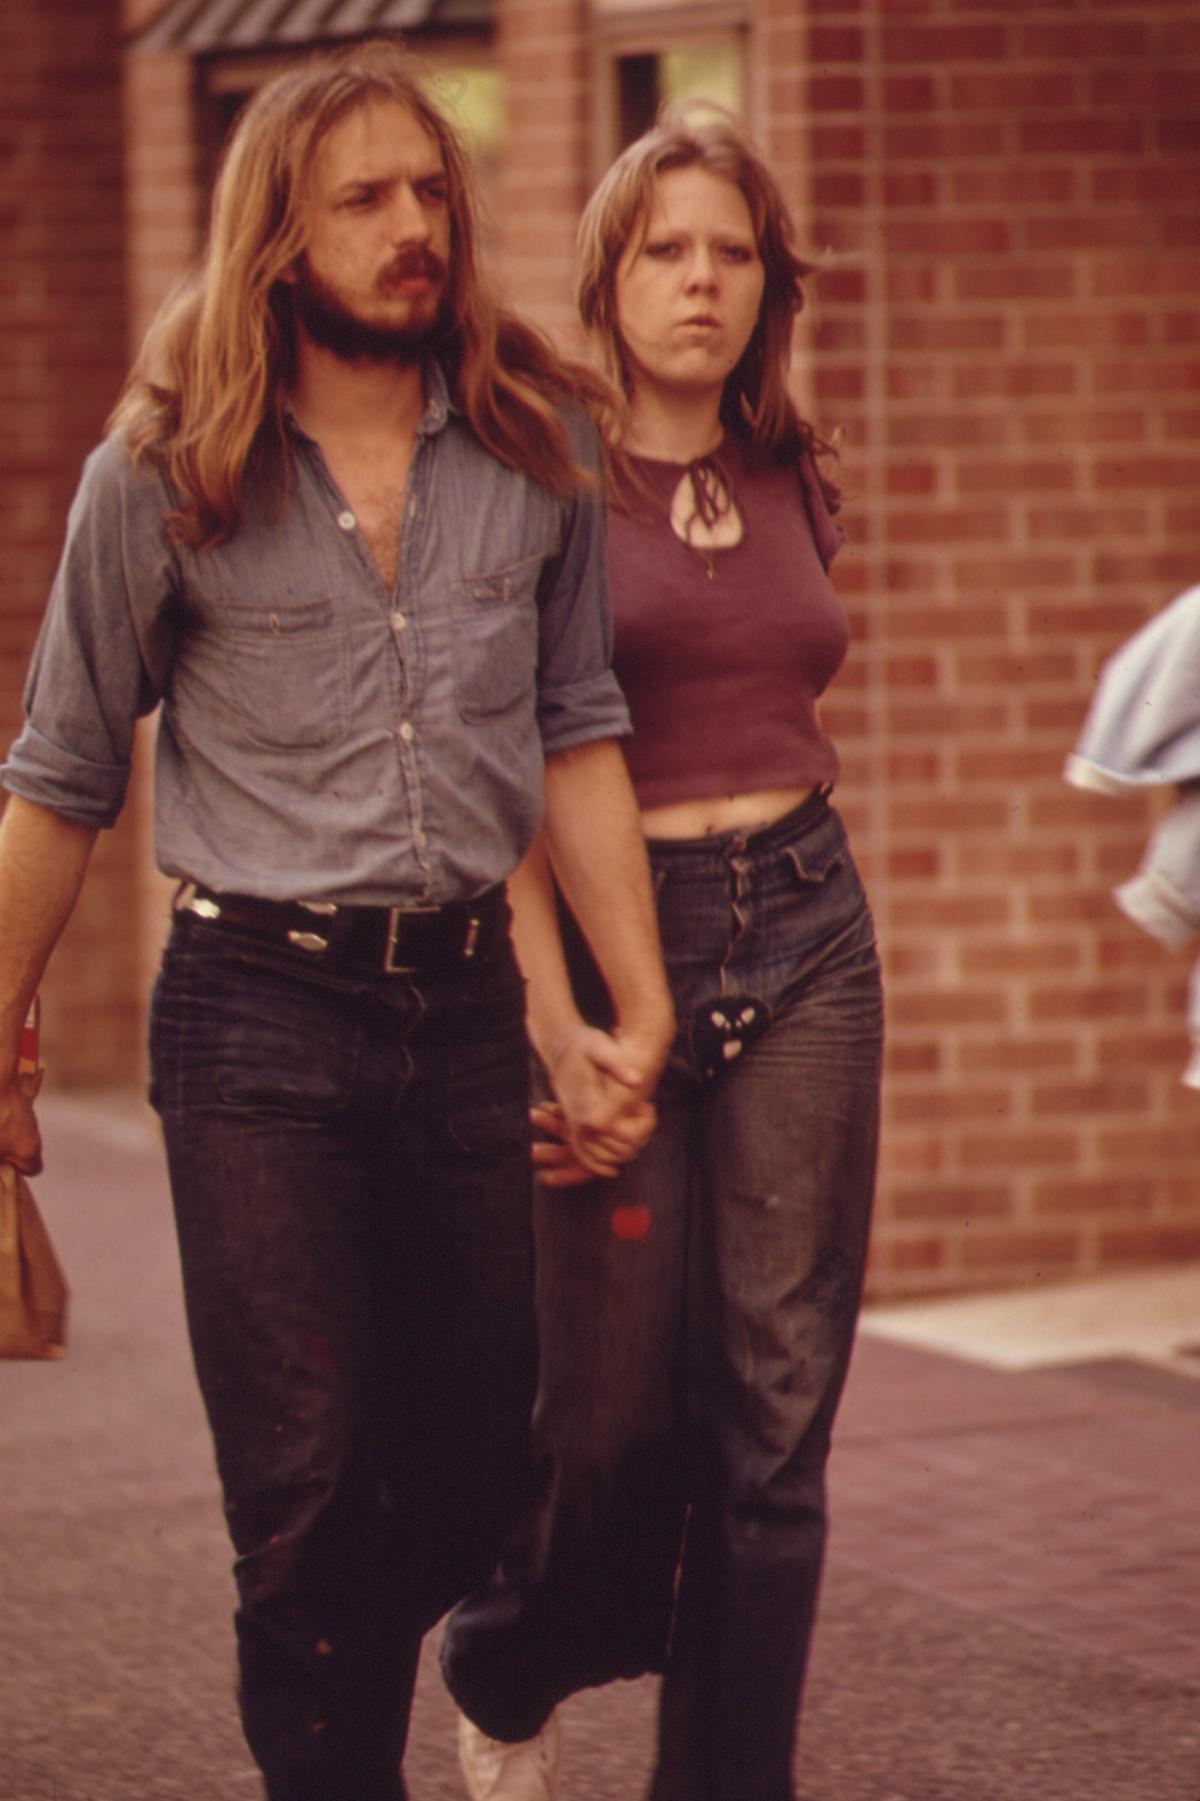 1970s couple walking hand in hand